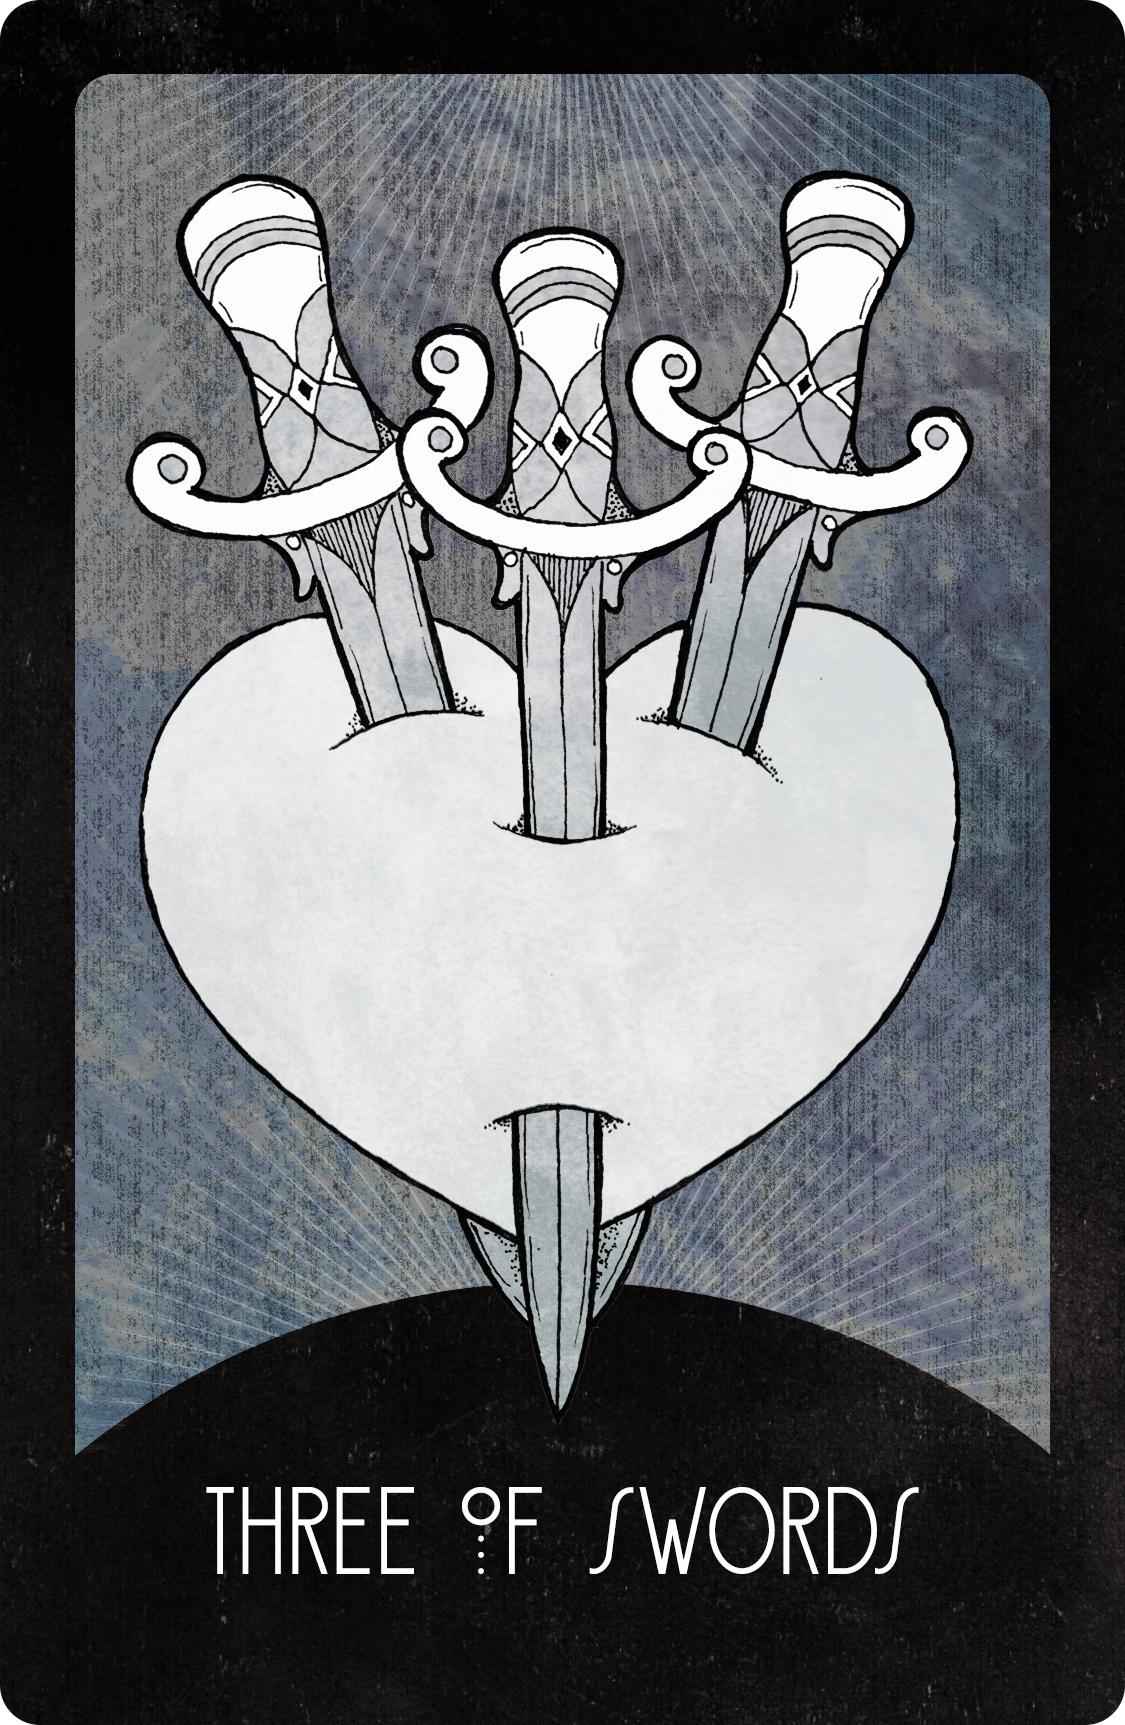 Inspirational Tarot Deck Three of Swords